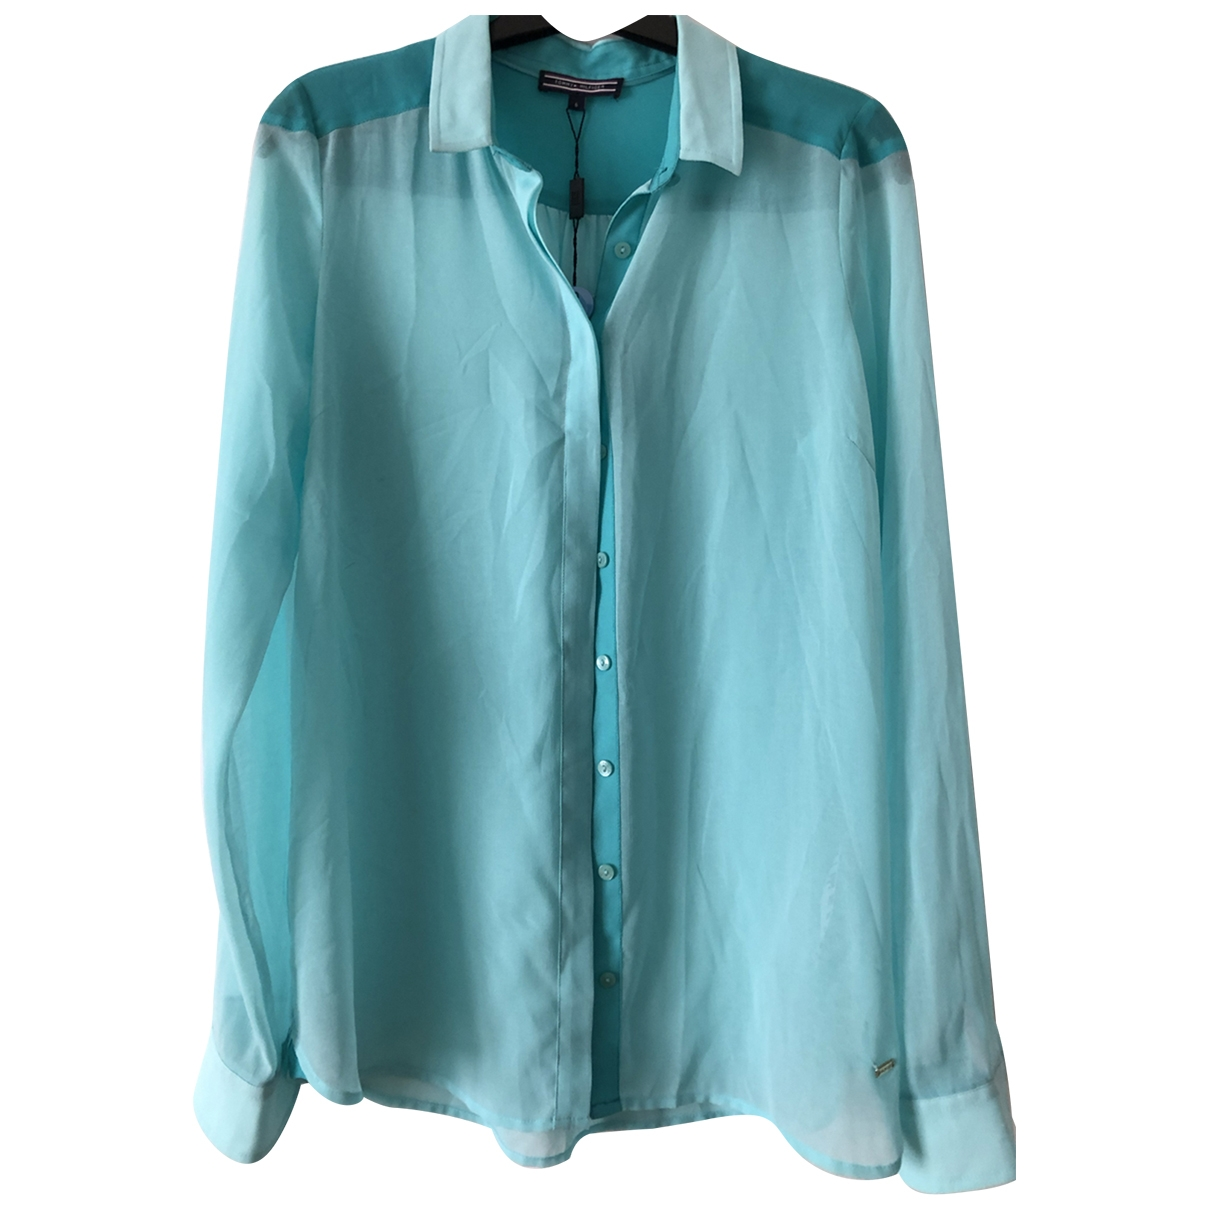 Tommy Hilfiger - Top   pour femme - turquoise